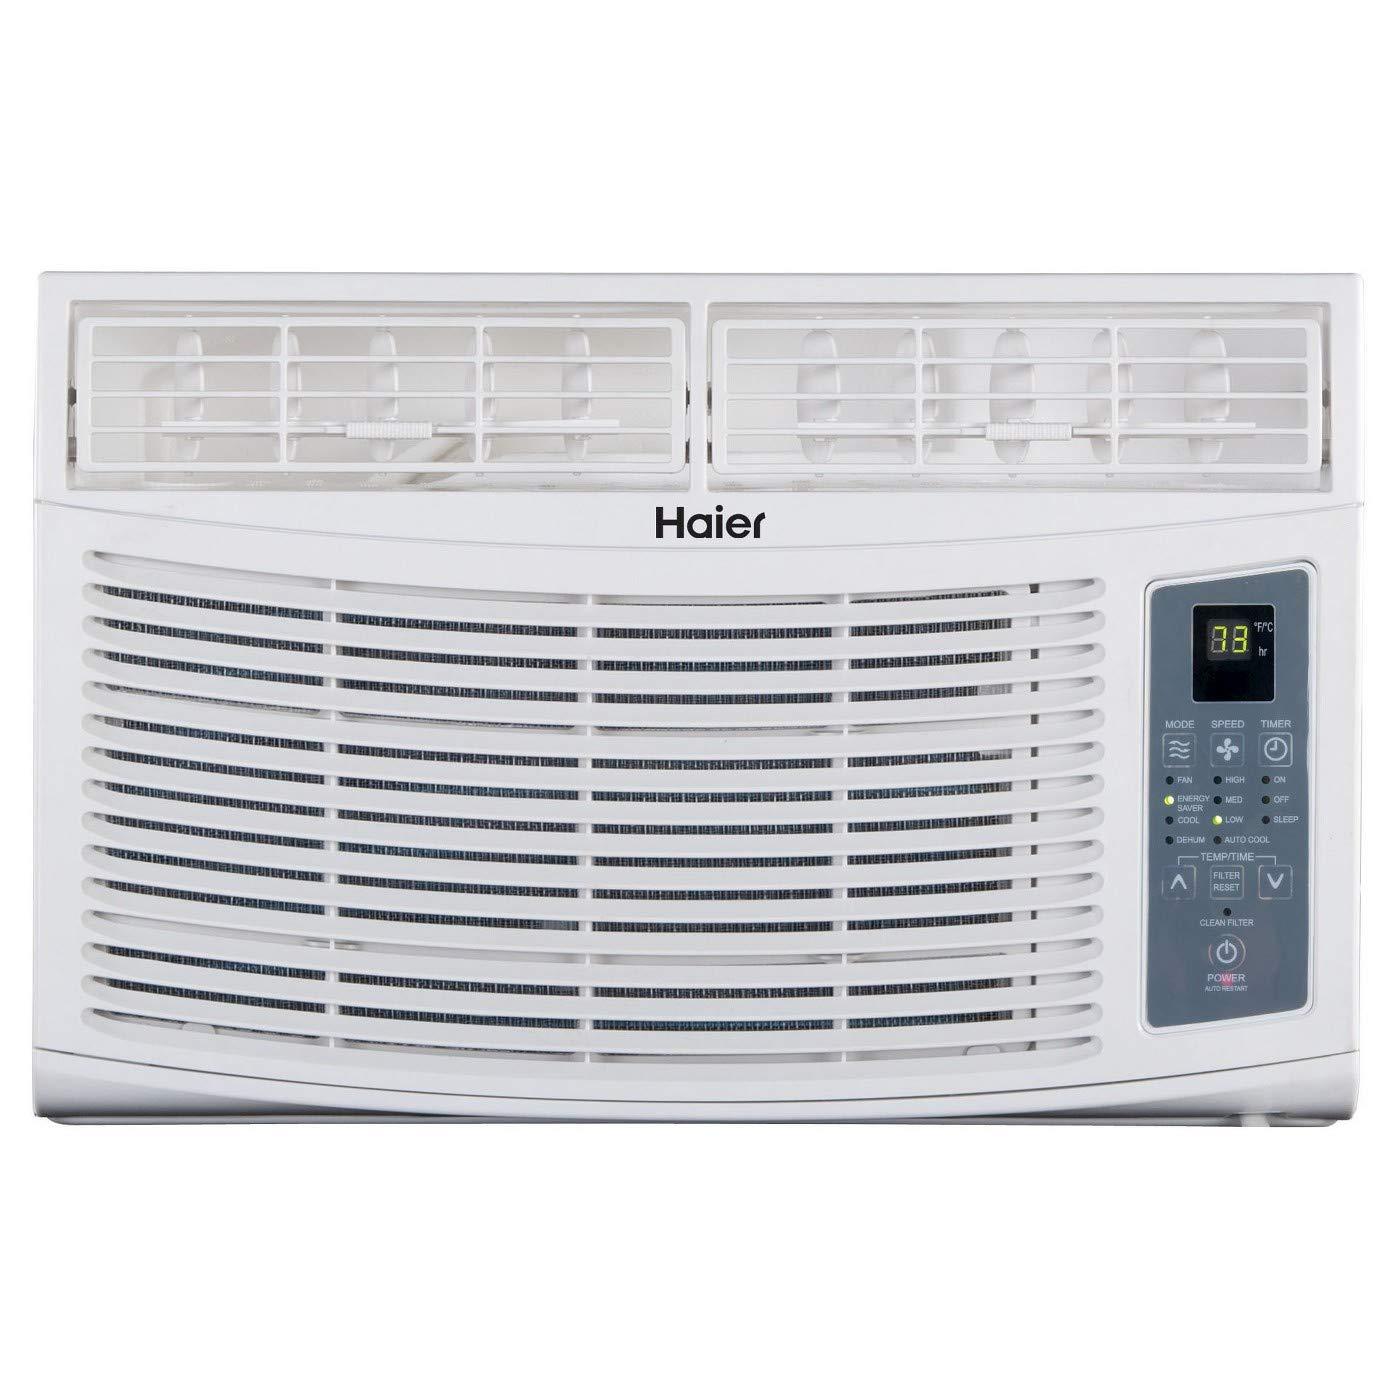 Haier 6k air conditioner - model #: HWR06XCR-T